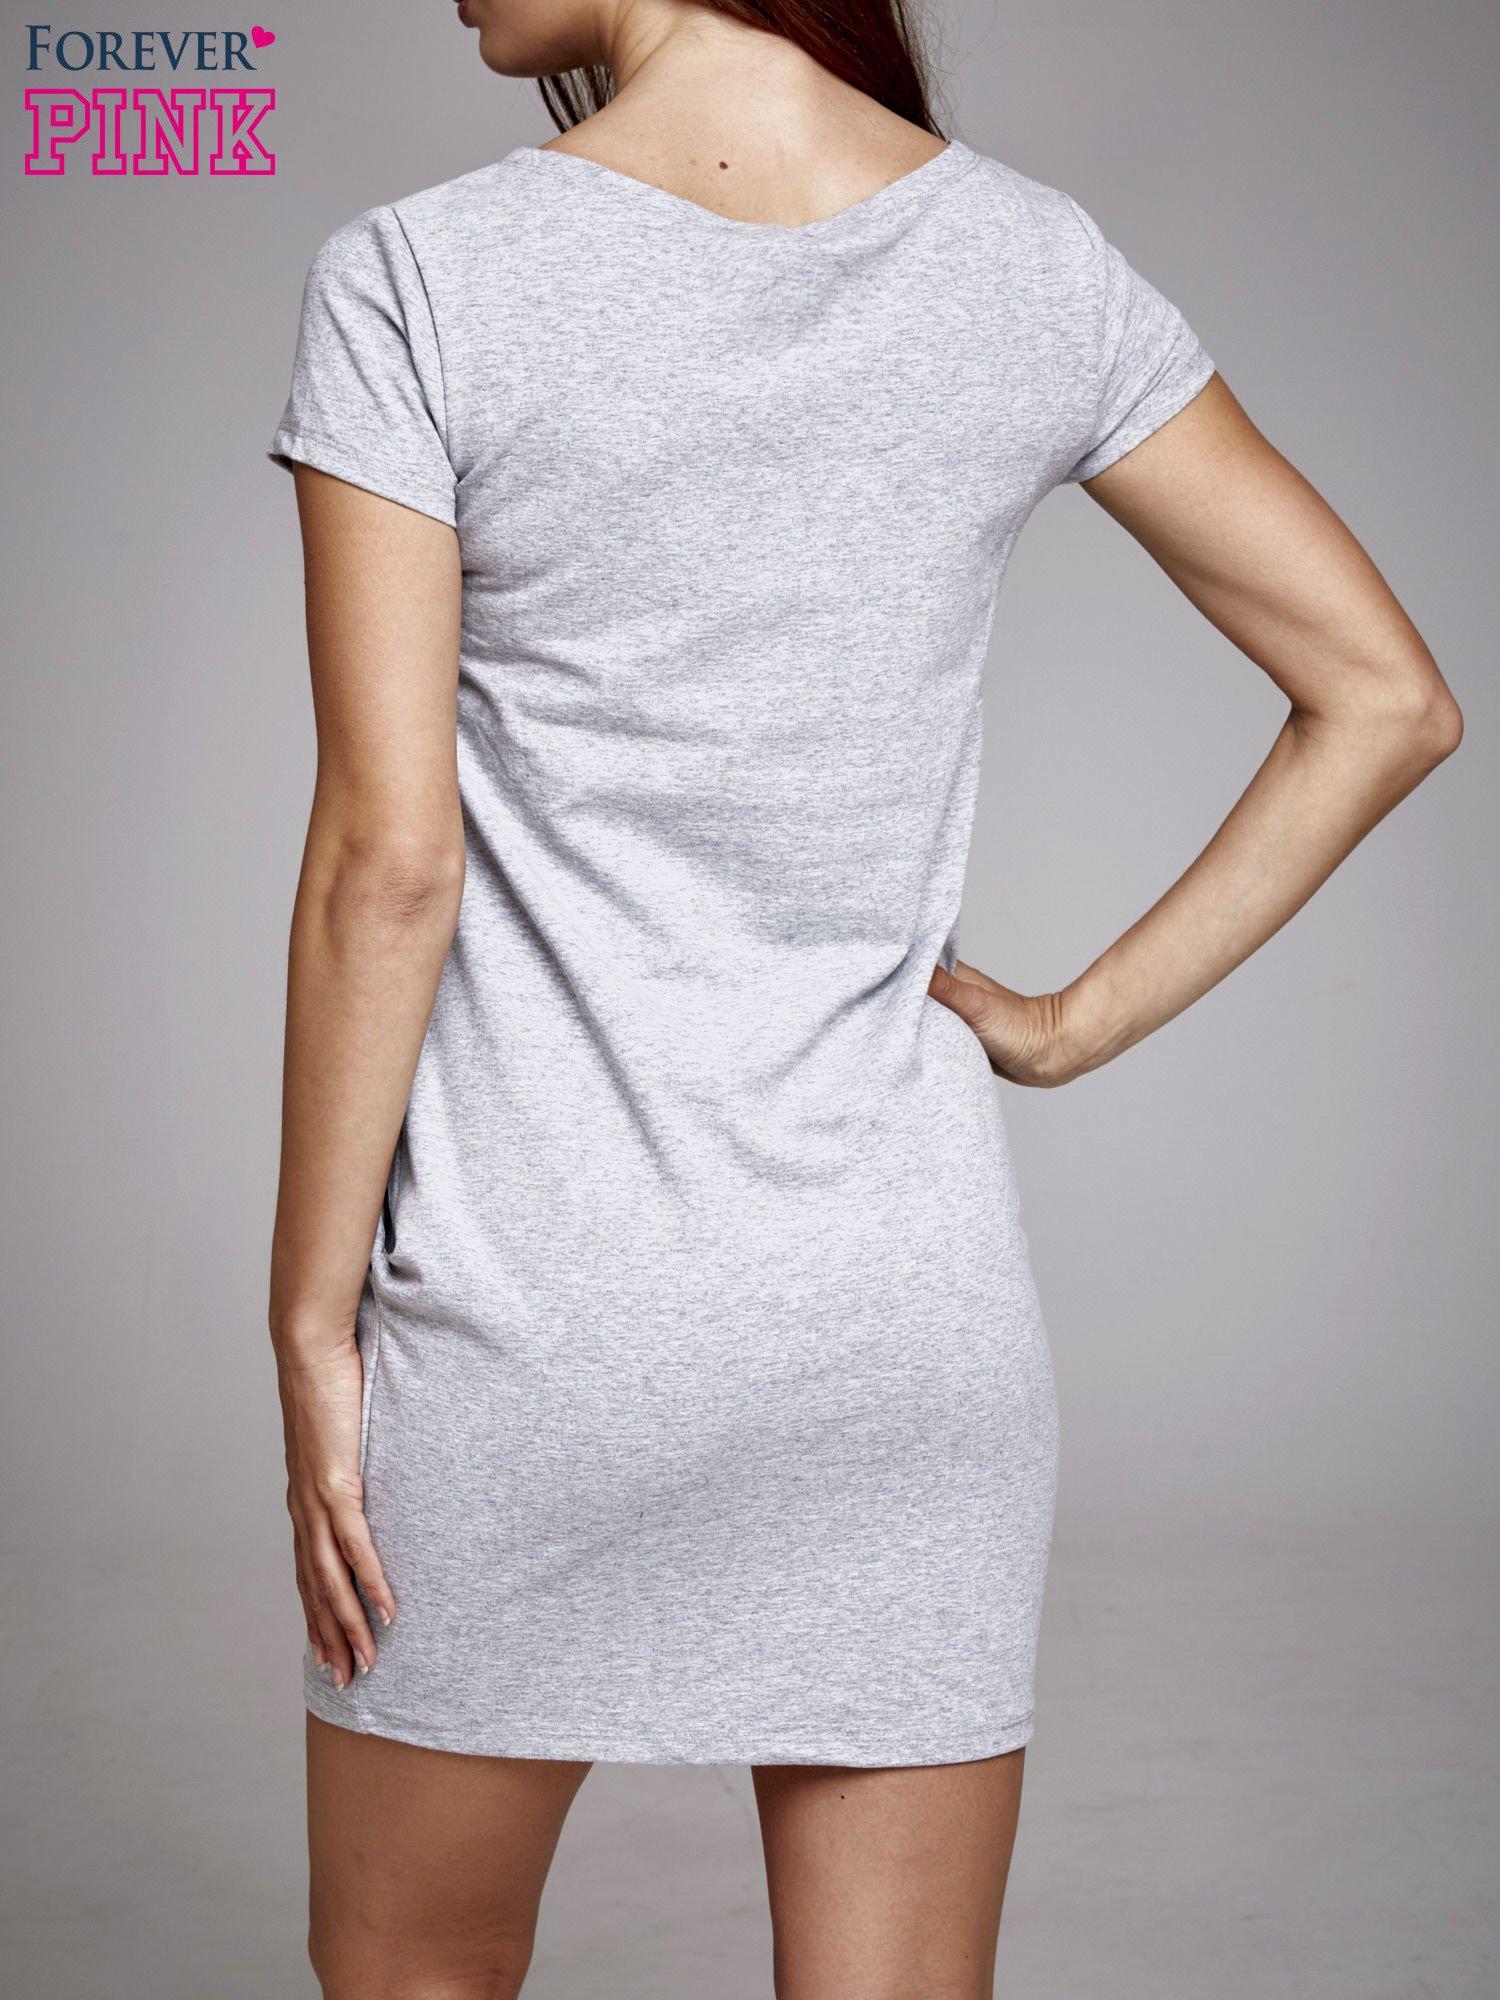 Szara sukienka dresowa ze srebrnym printem PARIS                                  zdj.                                  4